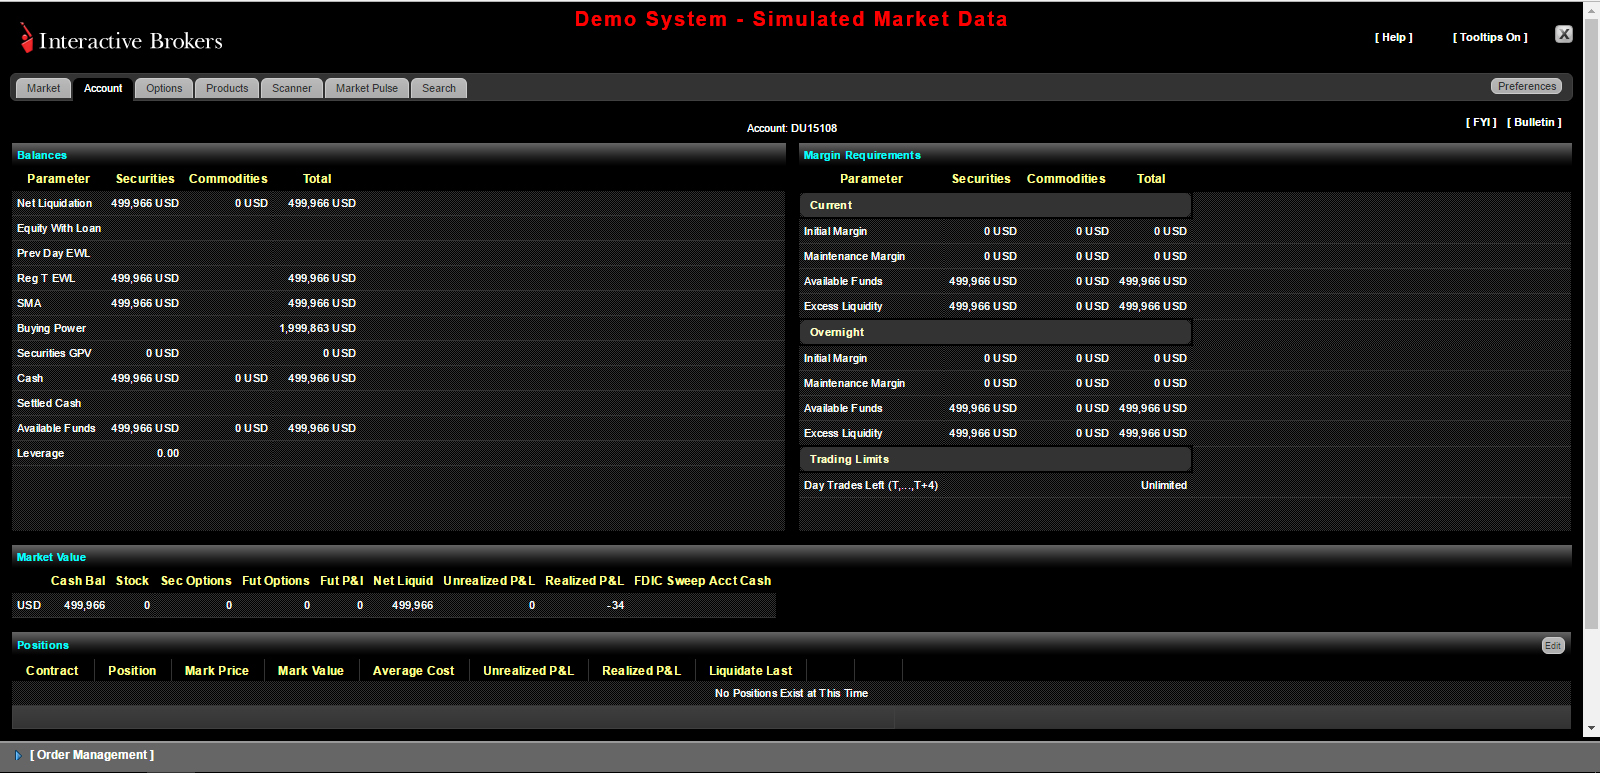 cfd-trading-tips-interactive-brokers-web-trading-platform